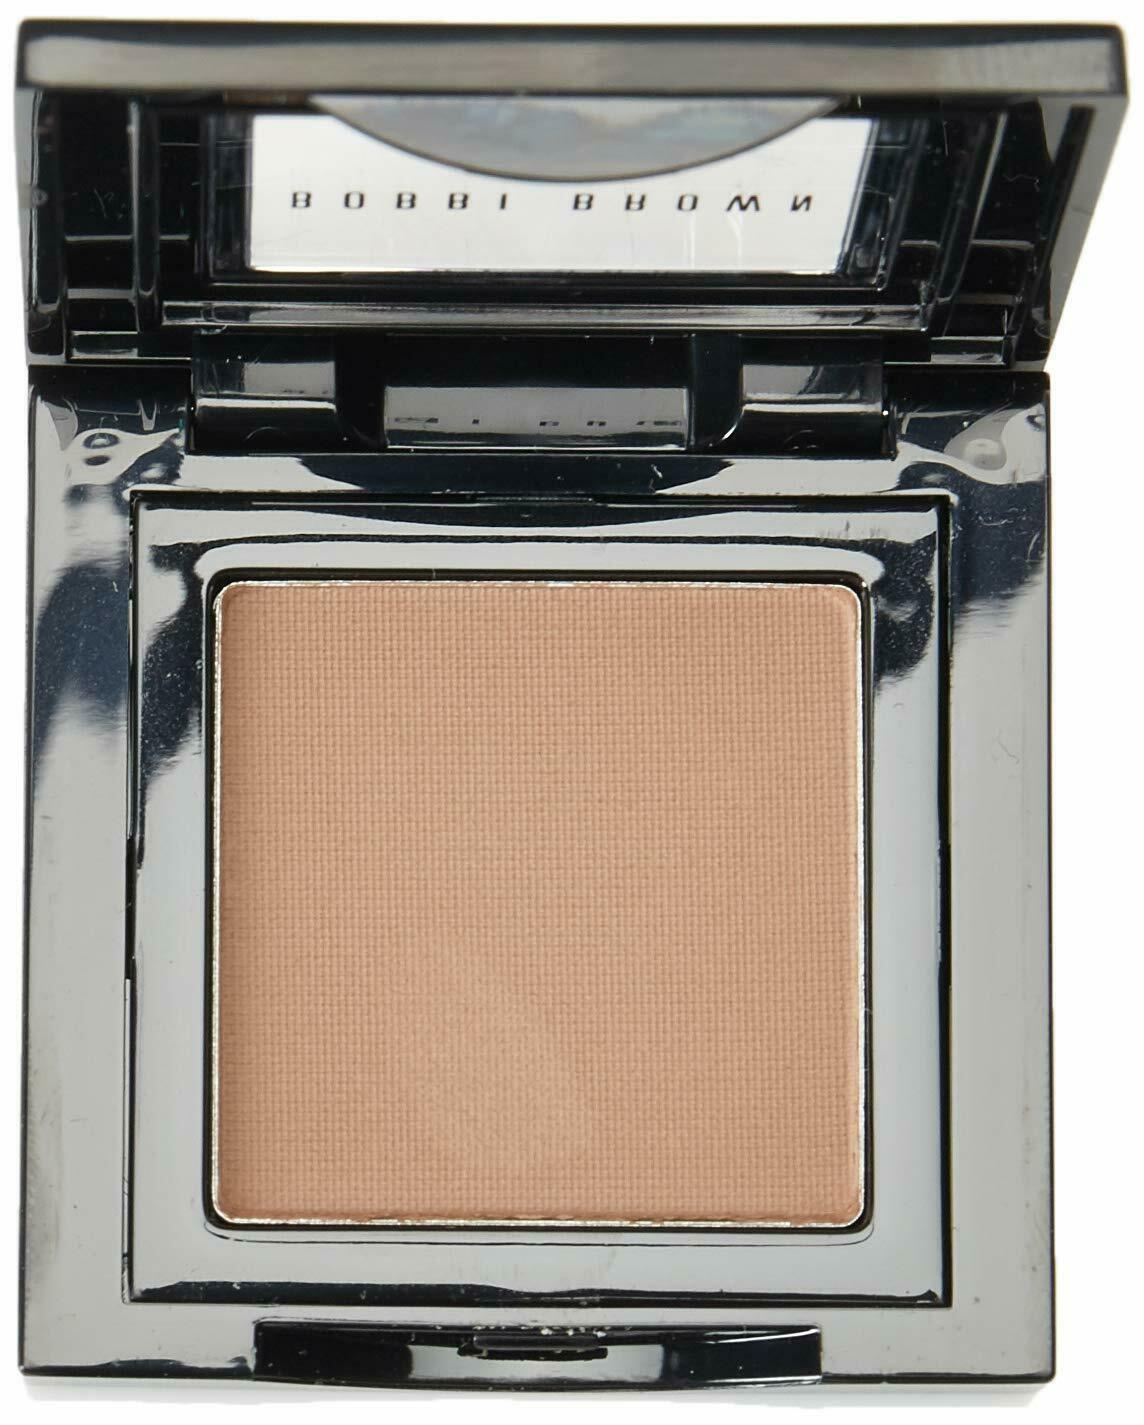 Bobbi Brown Eye Shadow Single in Blonde No. 21 .08 oz 2.5 g  - $28.70